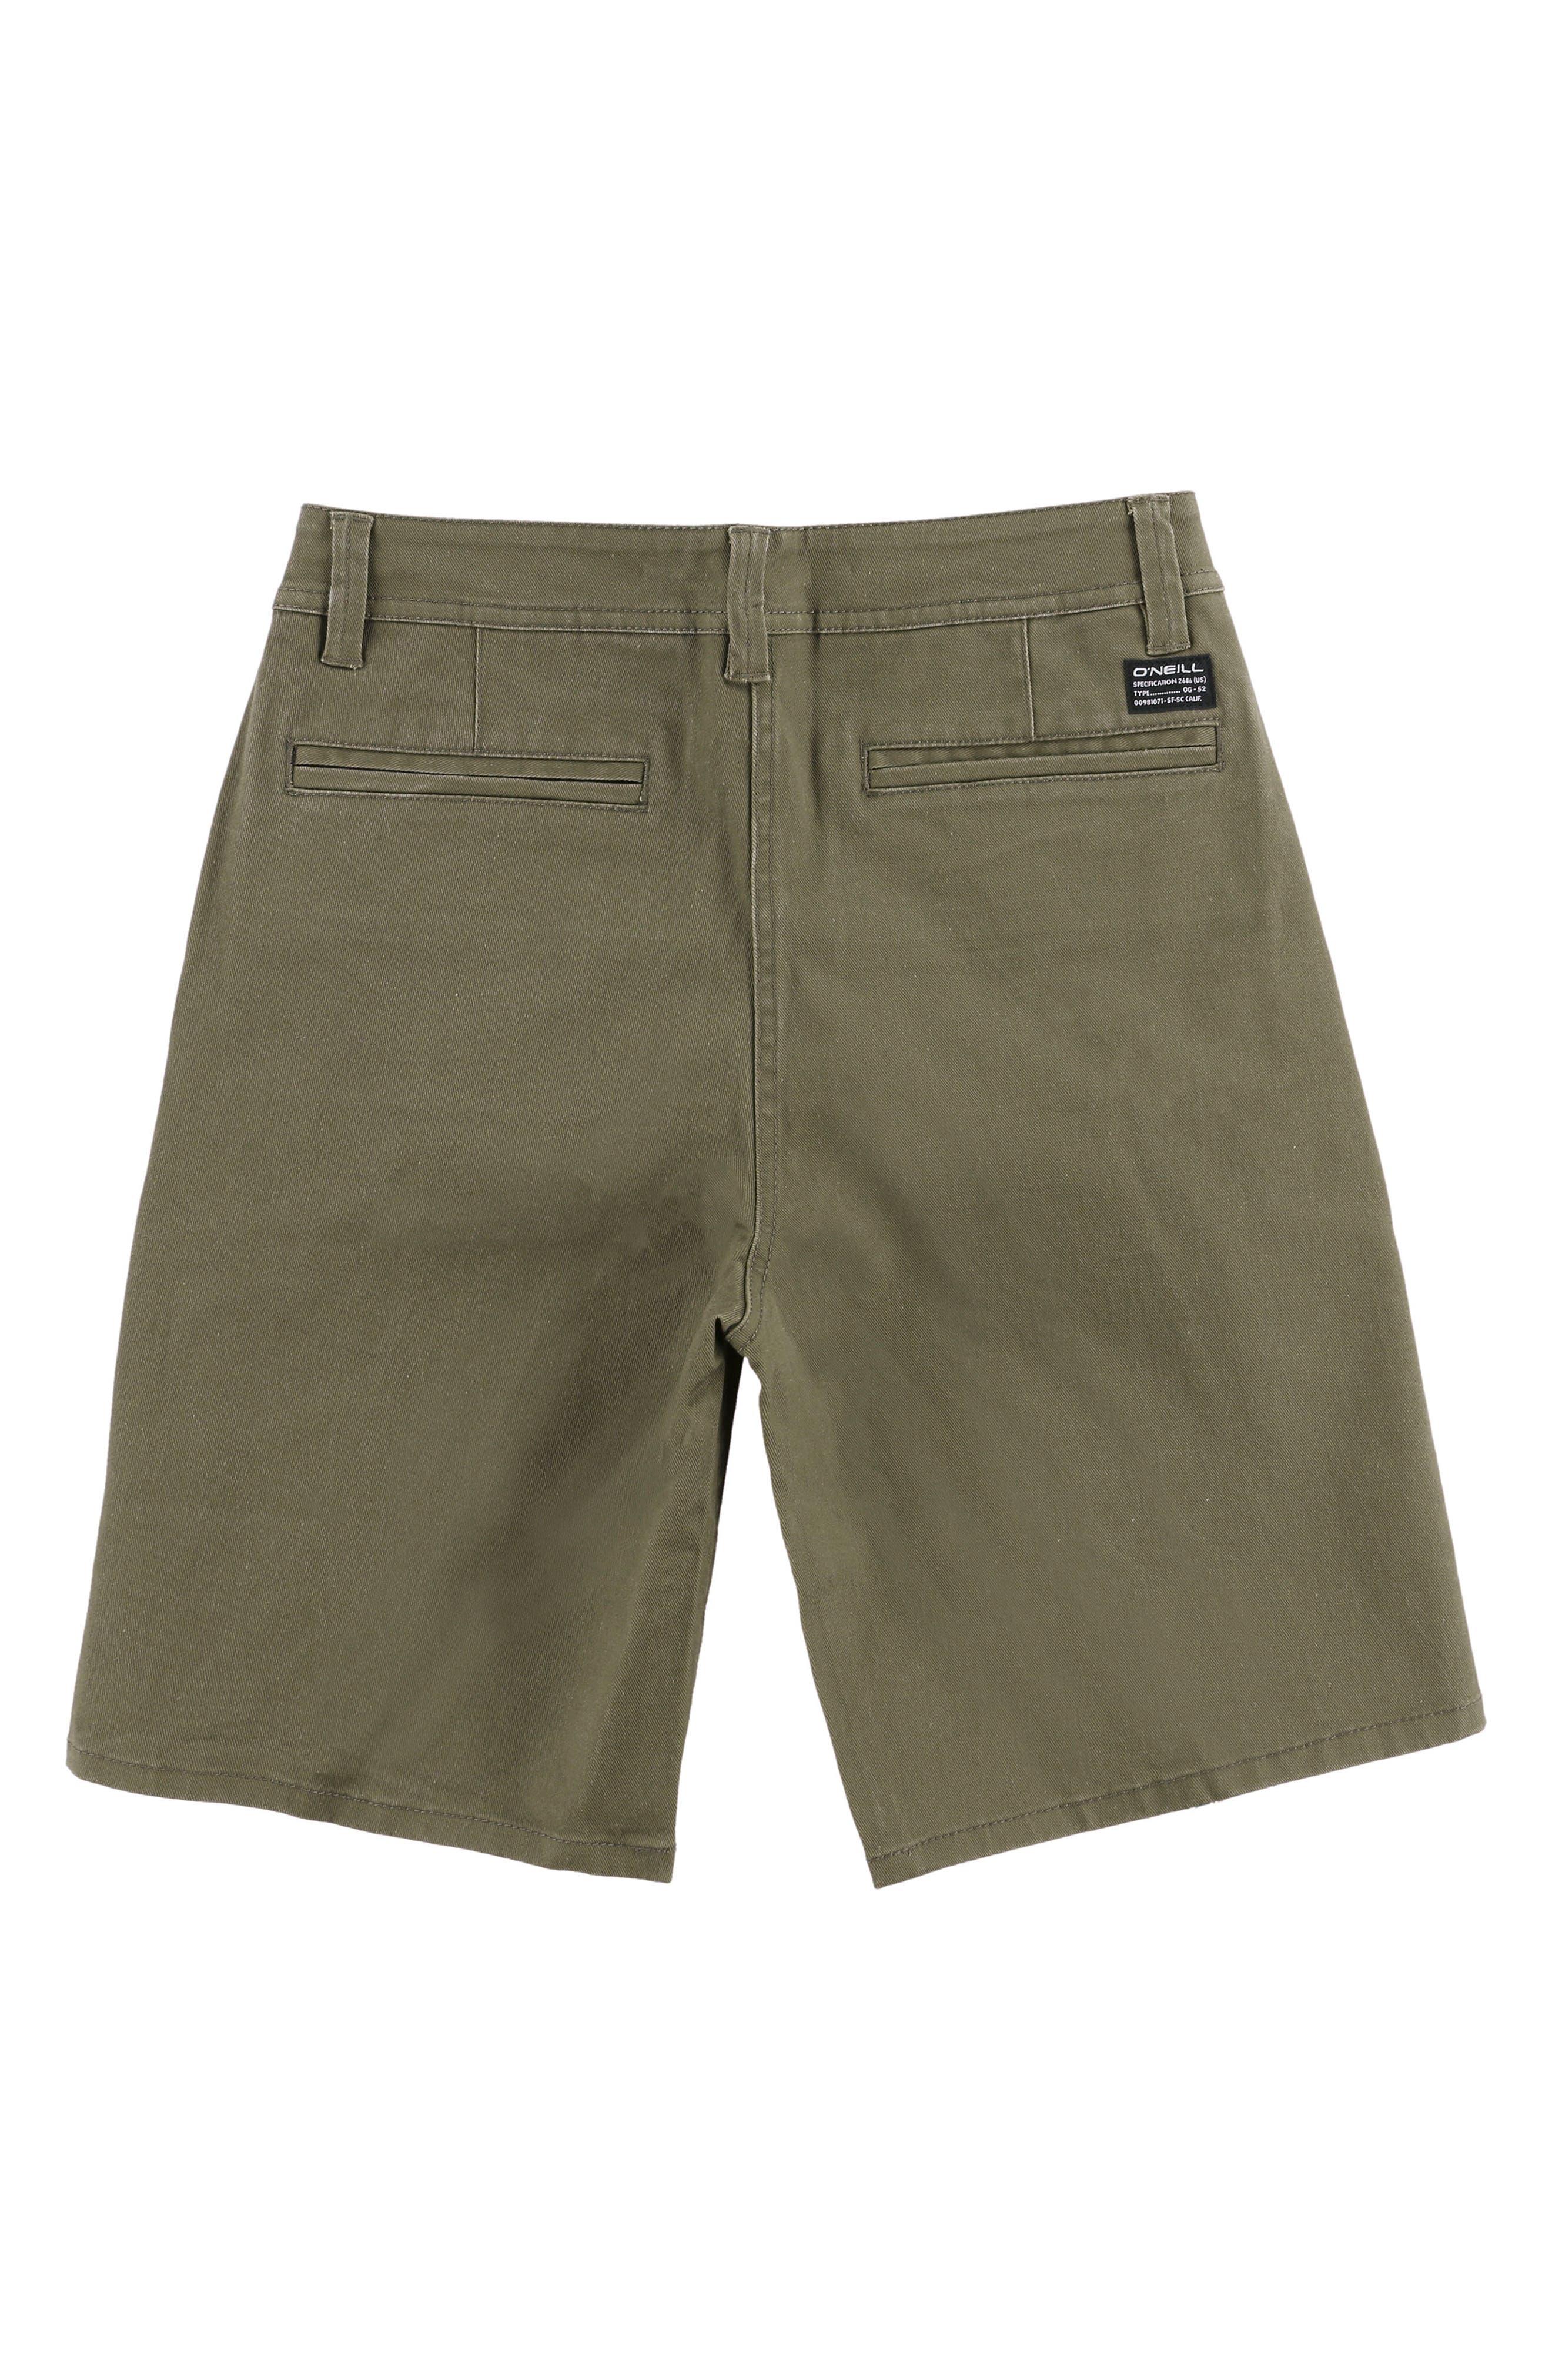 Rialto Shorts,                             Alternate thumbnail 2, color,                             Dark Army